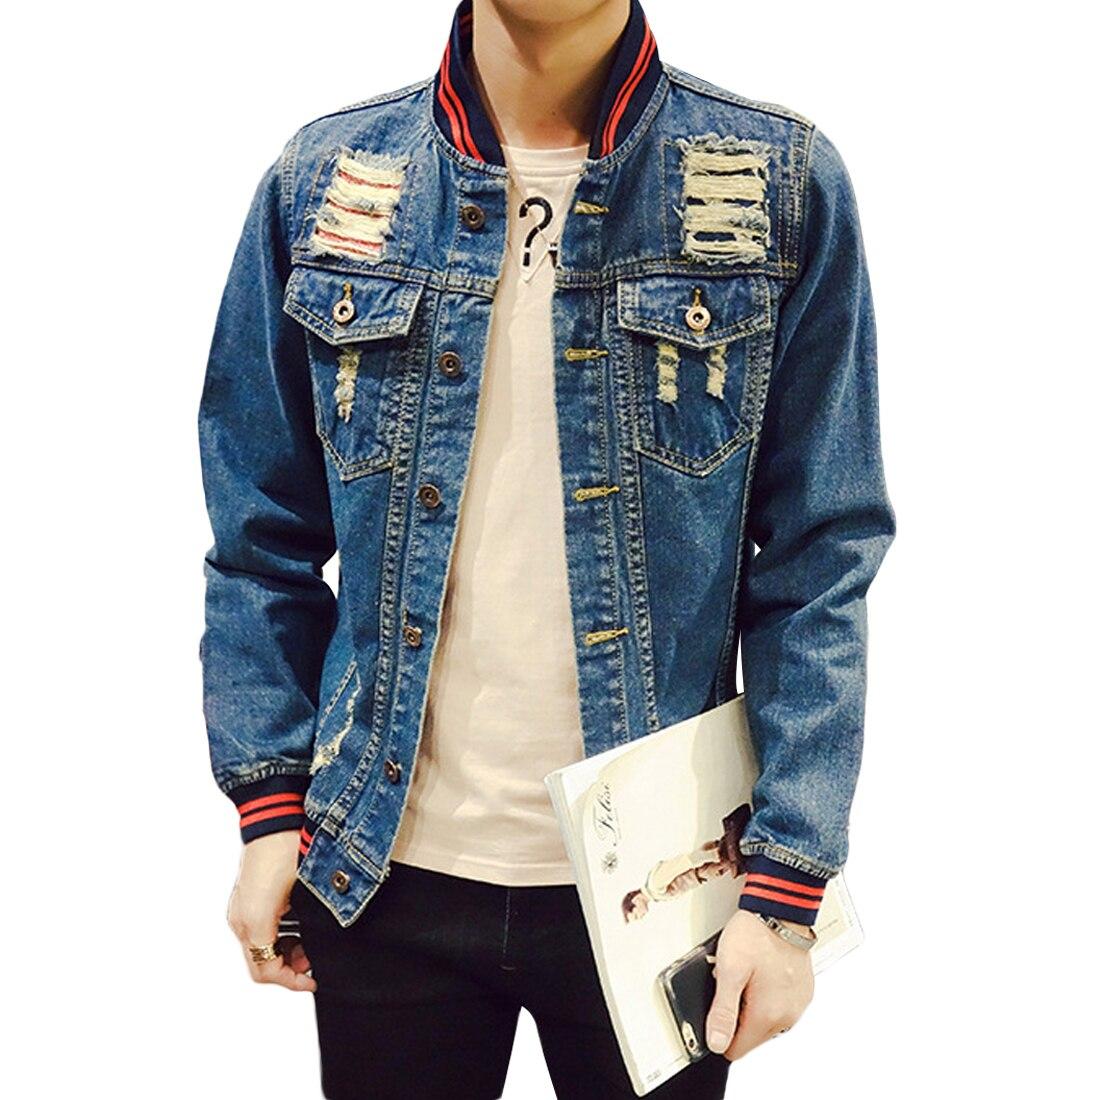 2017 Fashion Slim Denim Jacket Men Long Sleeve Patchwork Jeans Hole Coats Summer Plus Size 5XL Steampunk Bomber Jackets Blue Top